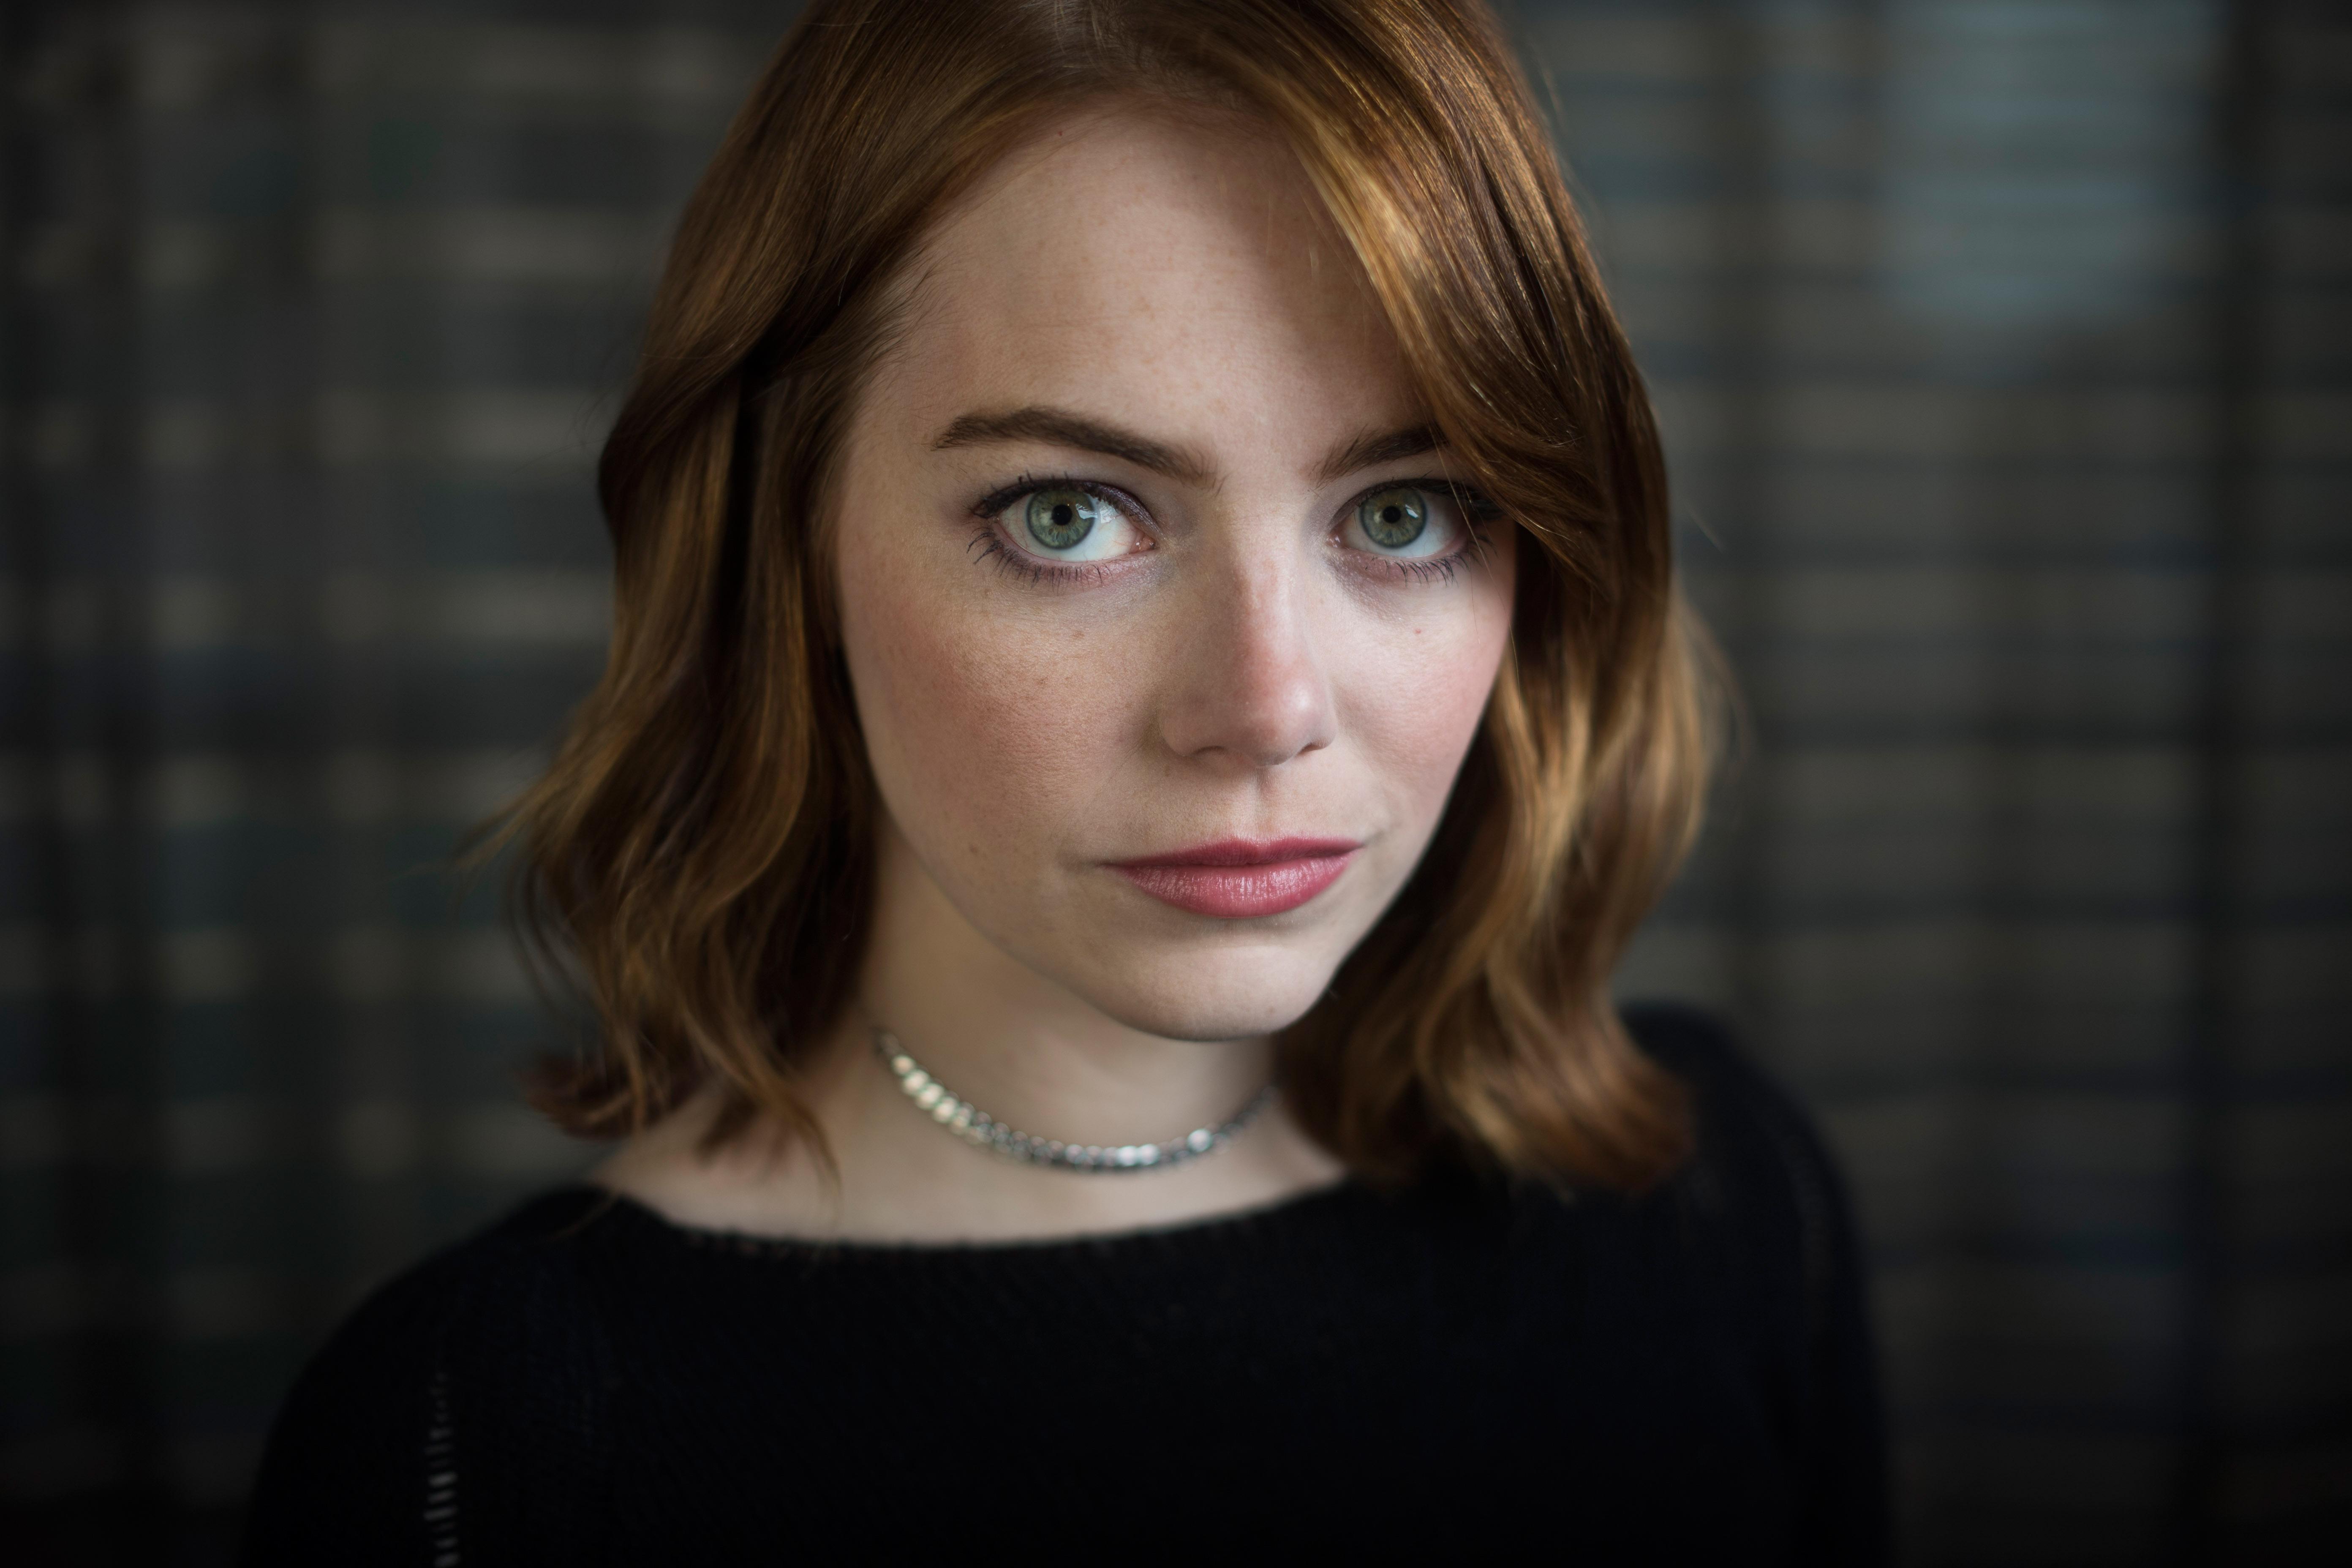 People 5568x3712 Emma Stone women brunette shoulder length hair green eyes women indoors actress face closeup